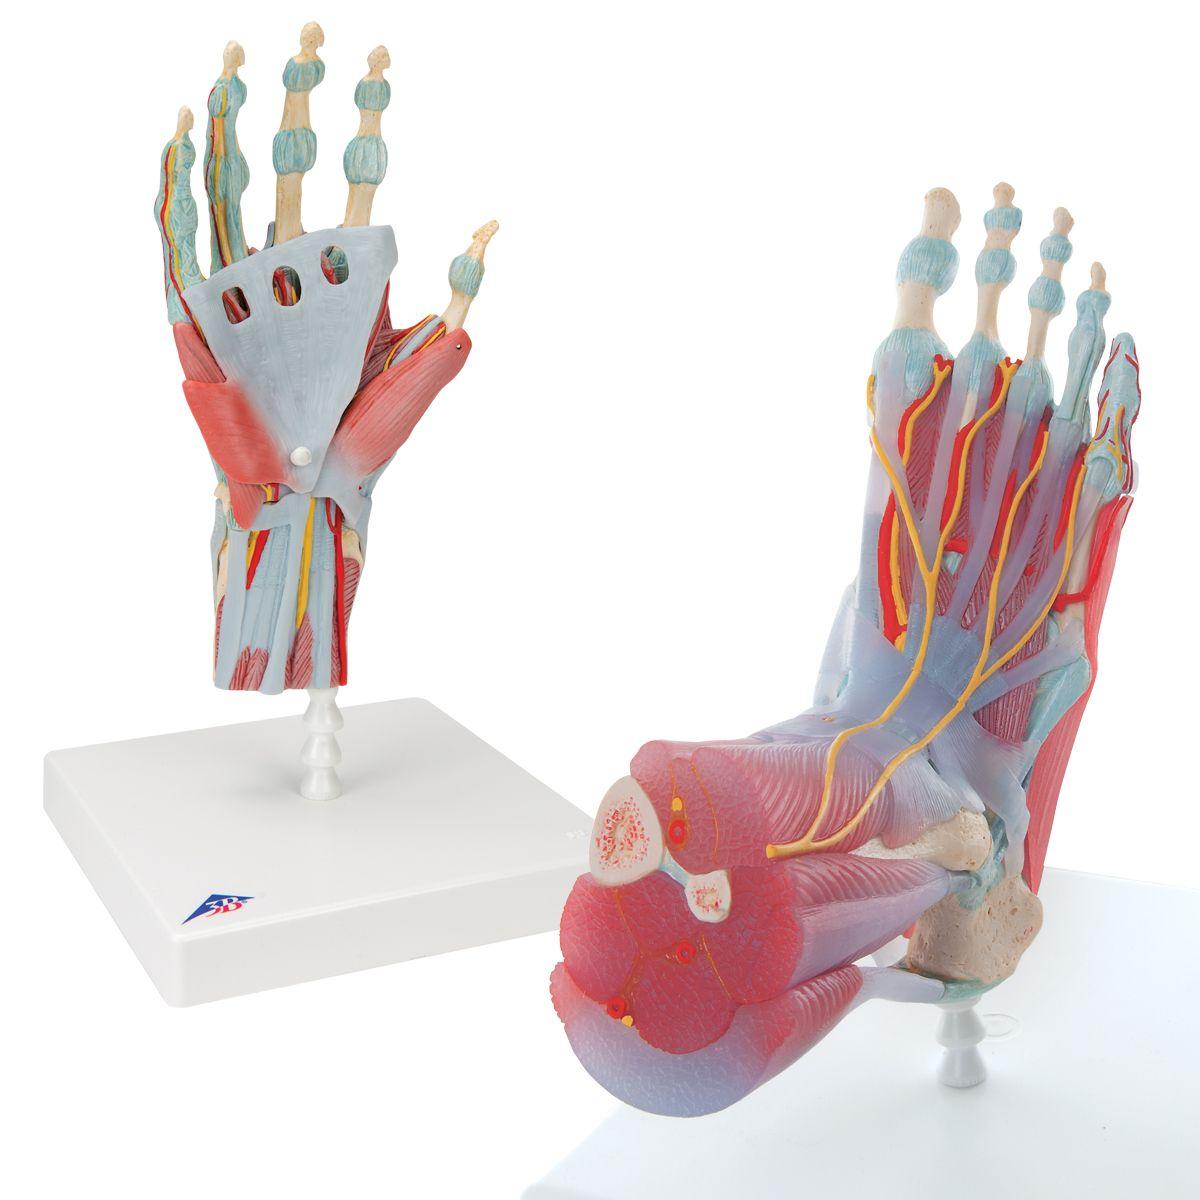 Anatomy Set Hand Foot 8000839 Anatomy Sets 3b Scientific